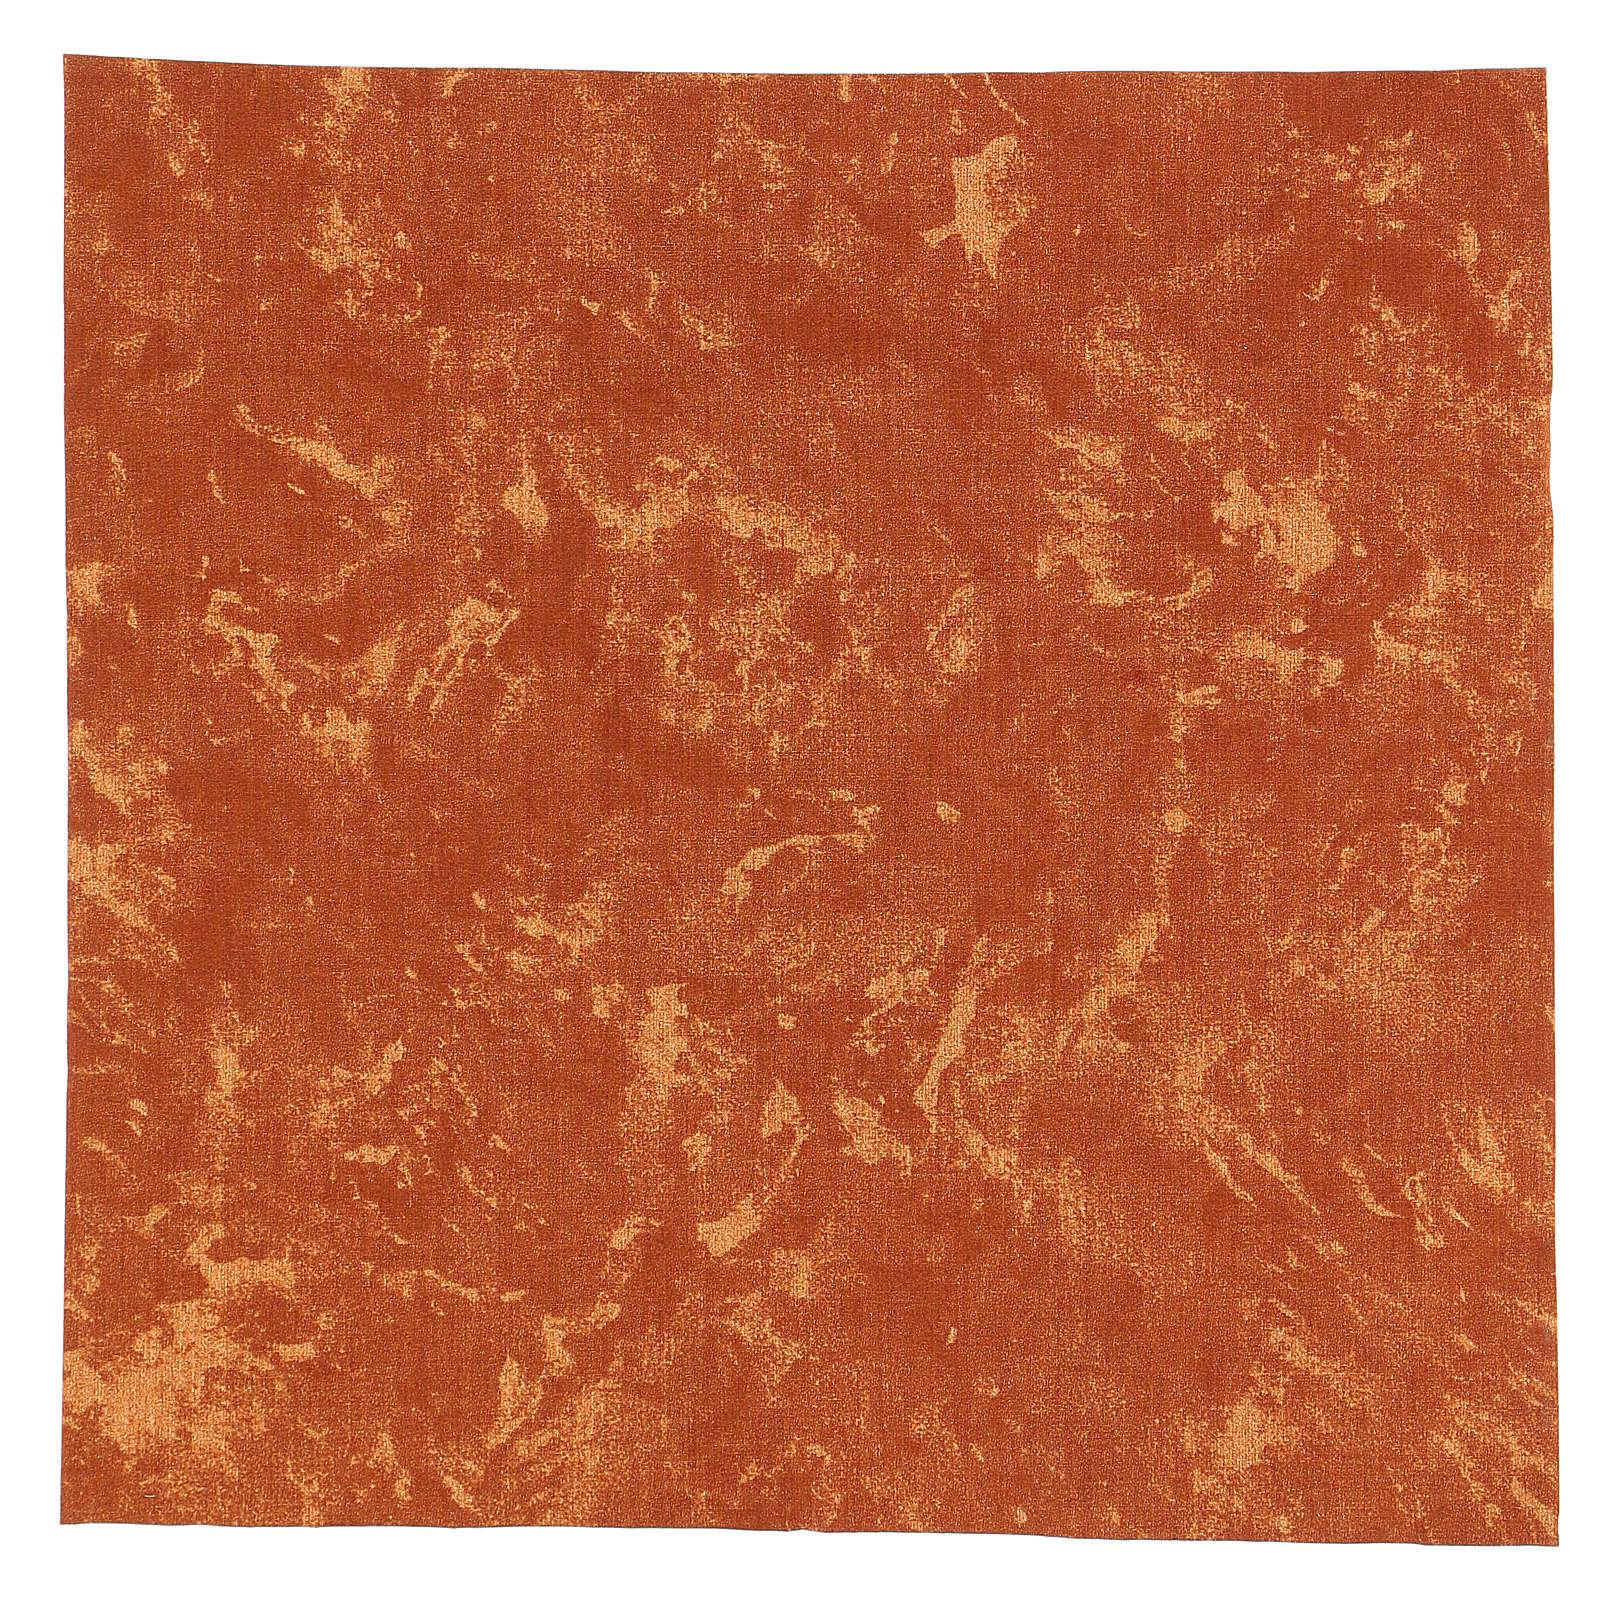 Papel modeable tierra roja 30x30 cm para belenes 4